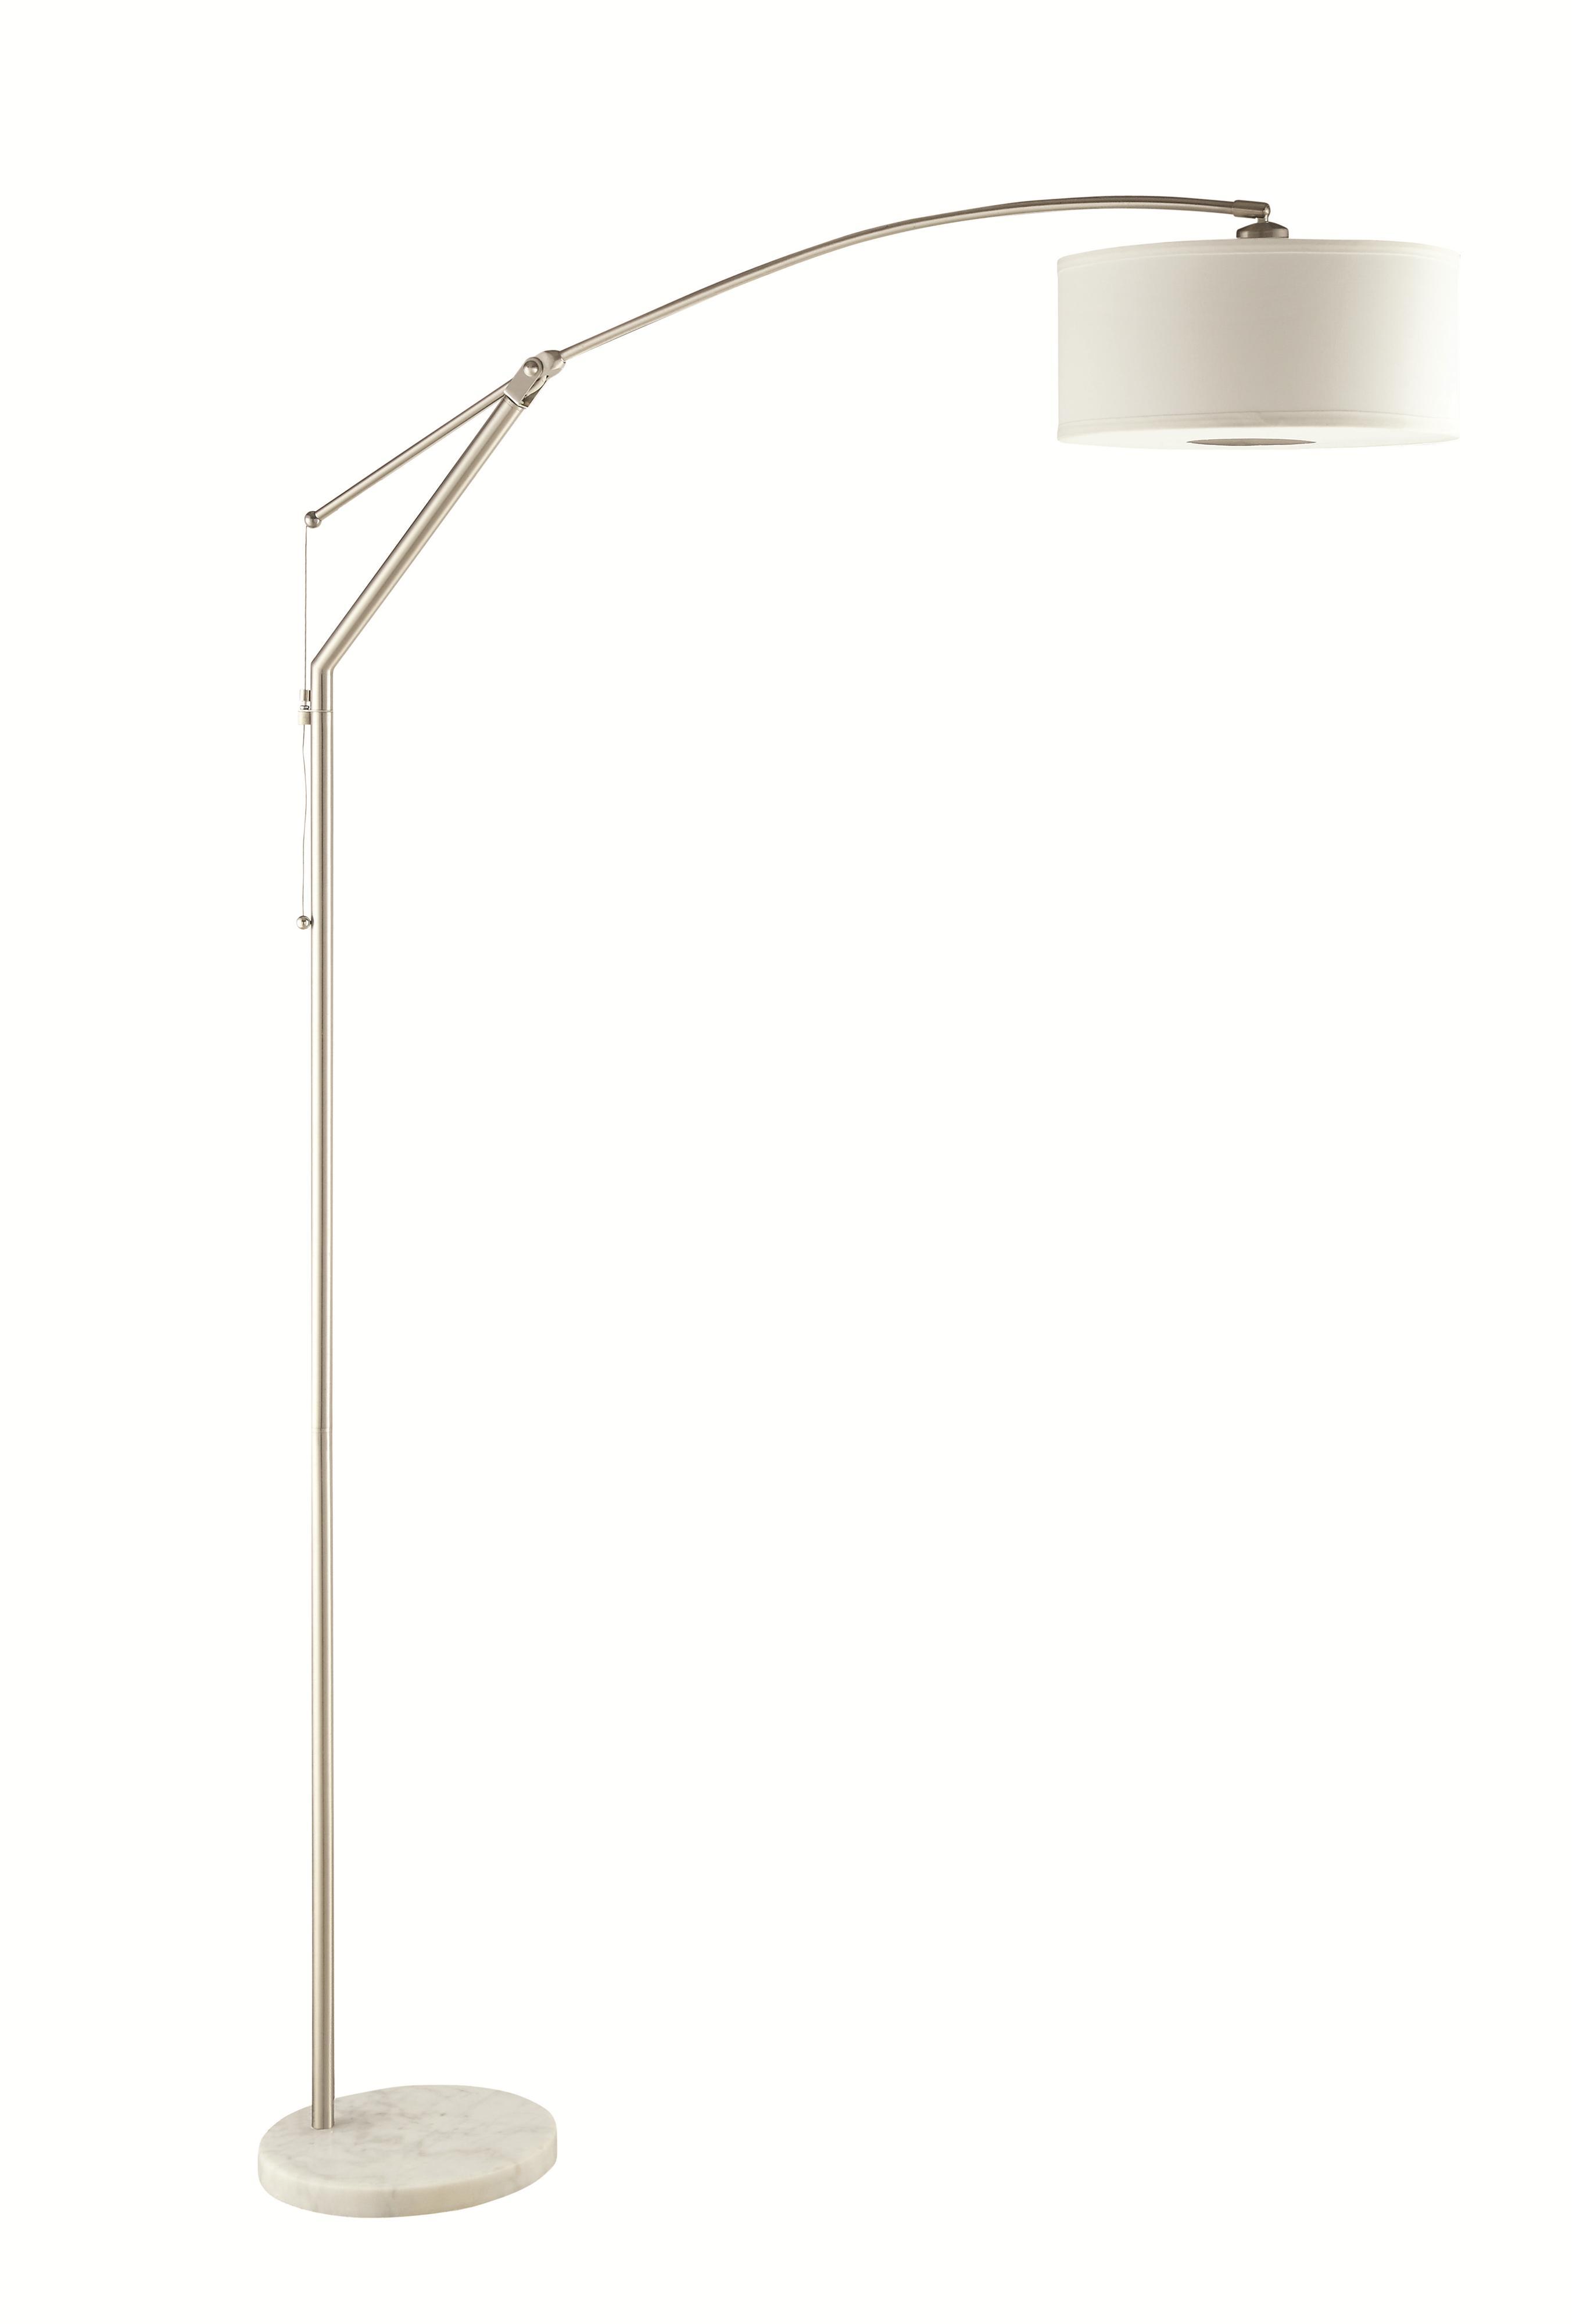 Coaster Floor Lamps Floor Lamp - Item Number: 901490